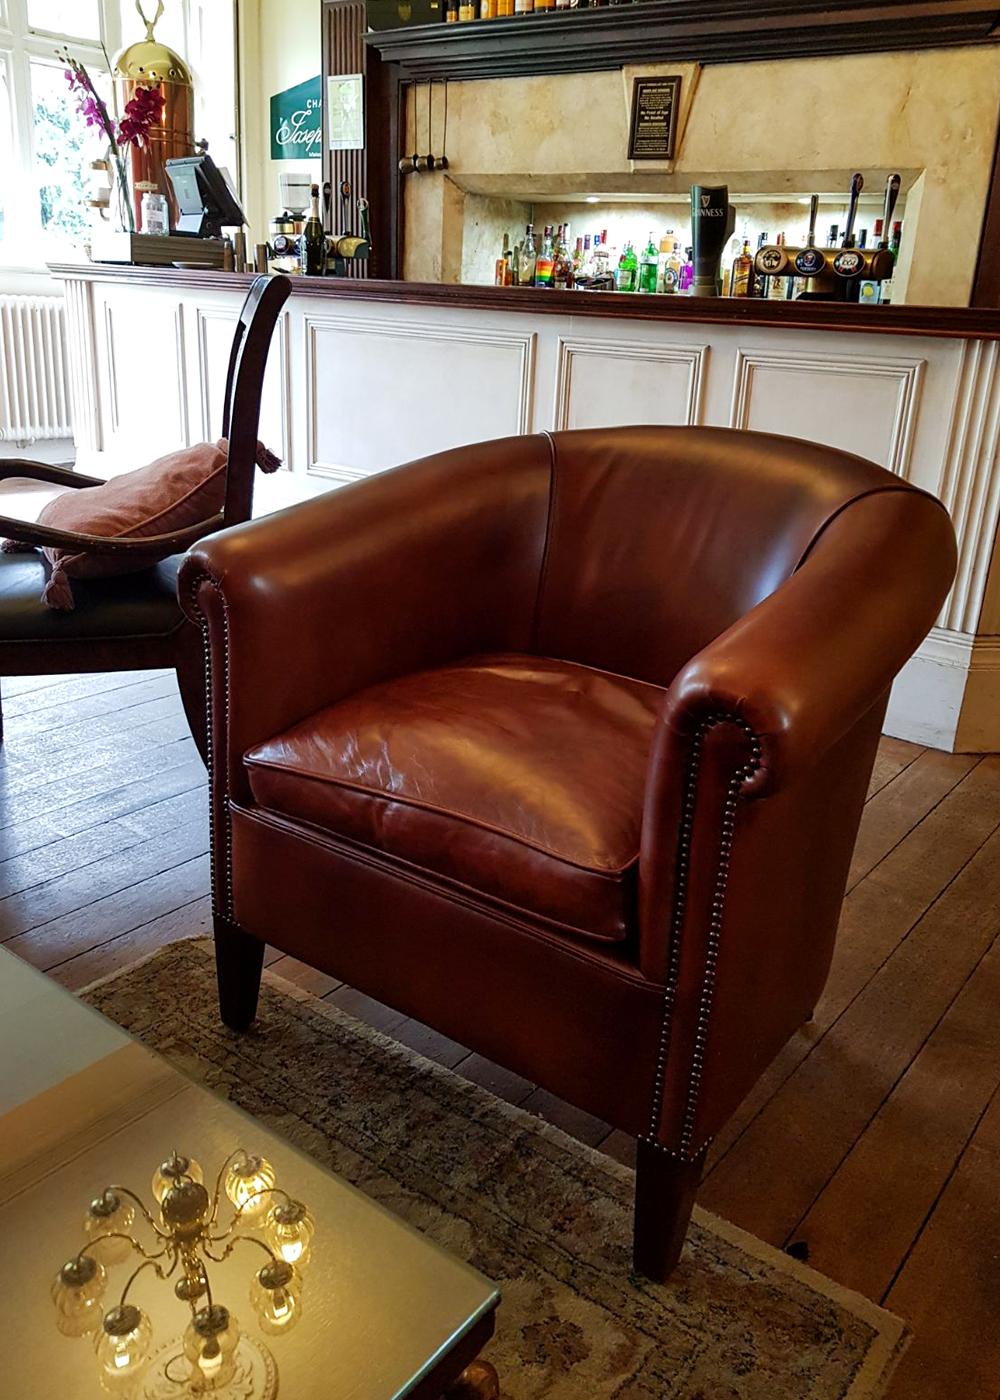 james-bond-chair-woodboroughhall-bar